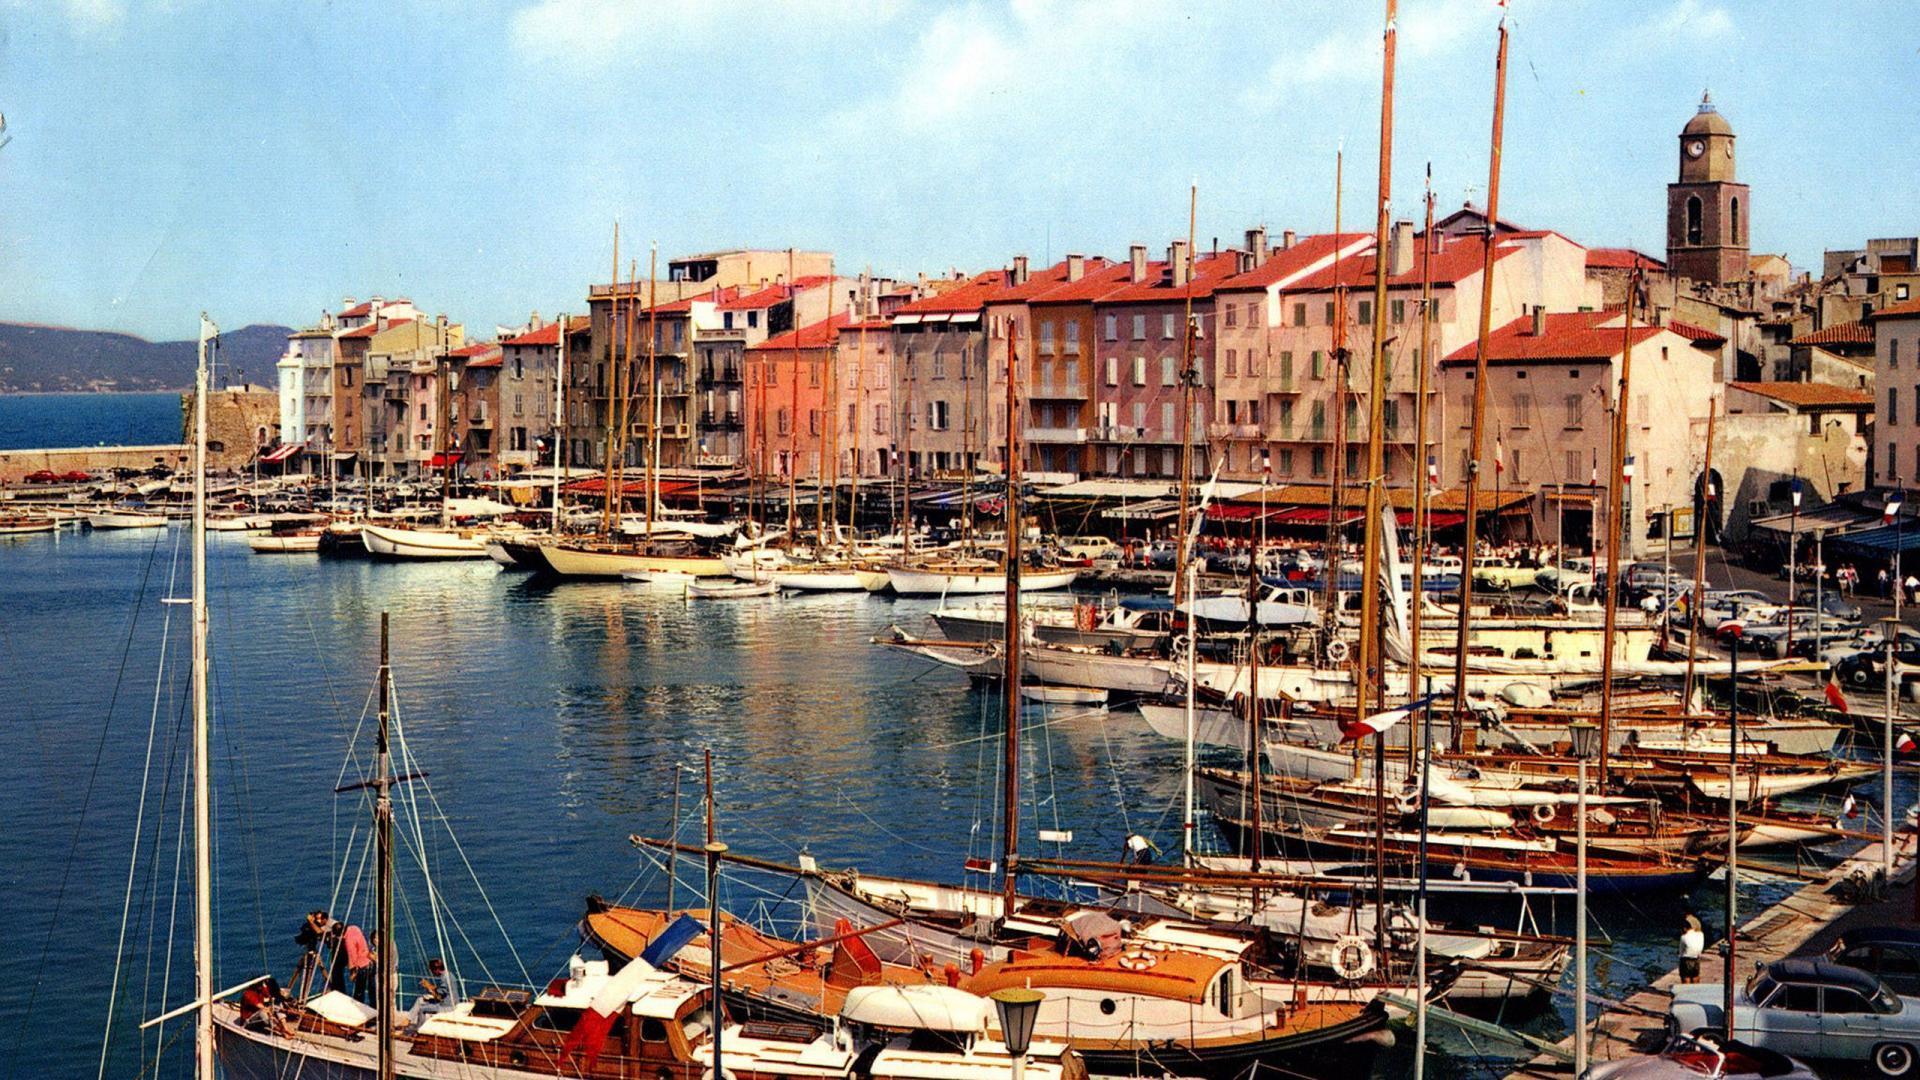 Harbor Marina In St Tropez France HD desktop wallpaper 1920x1080